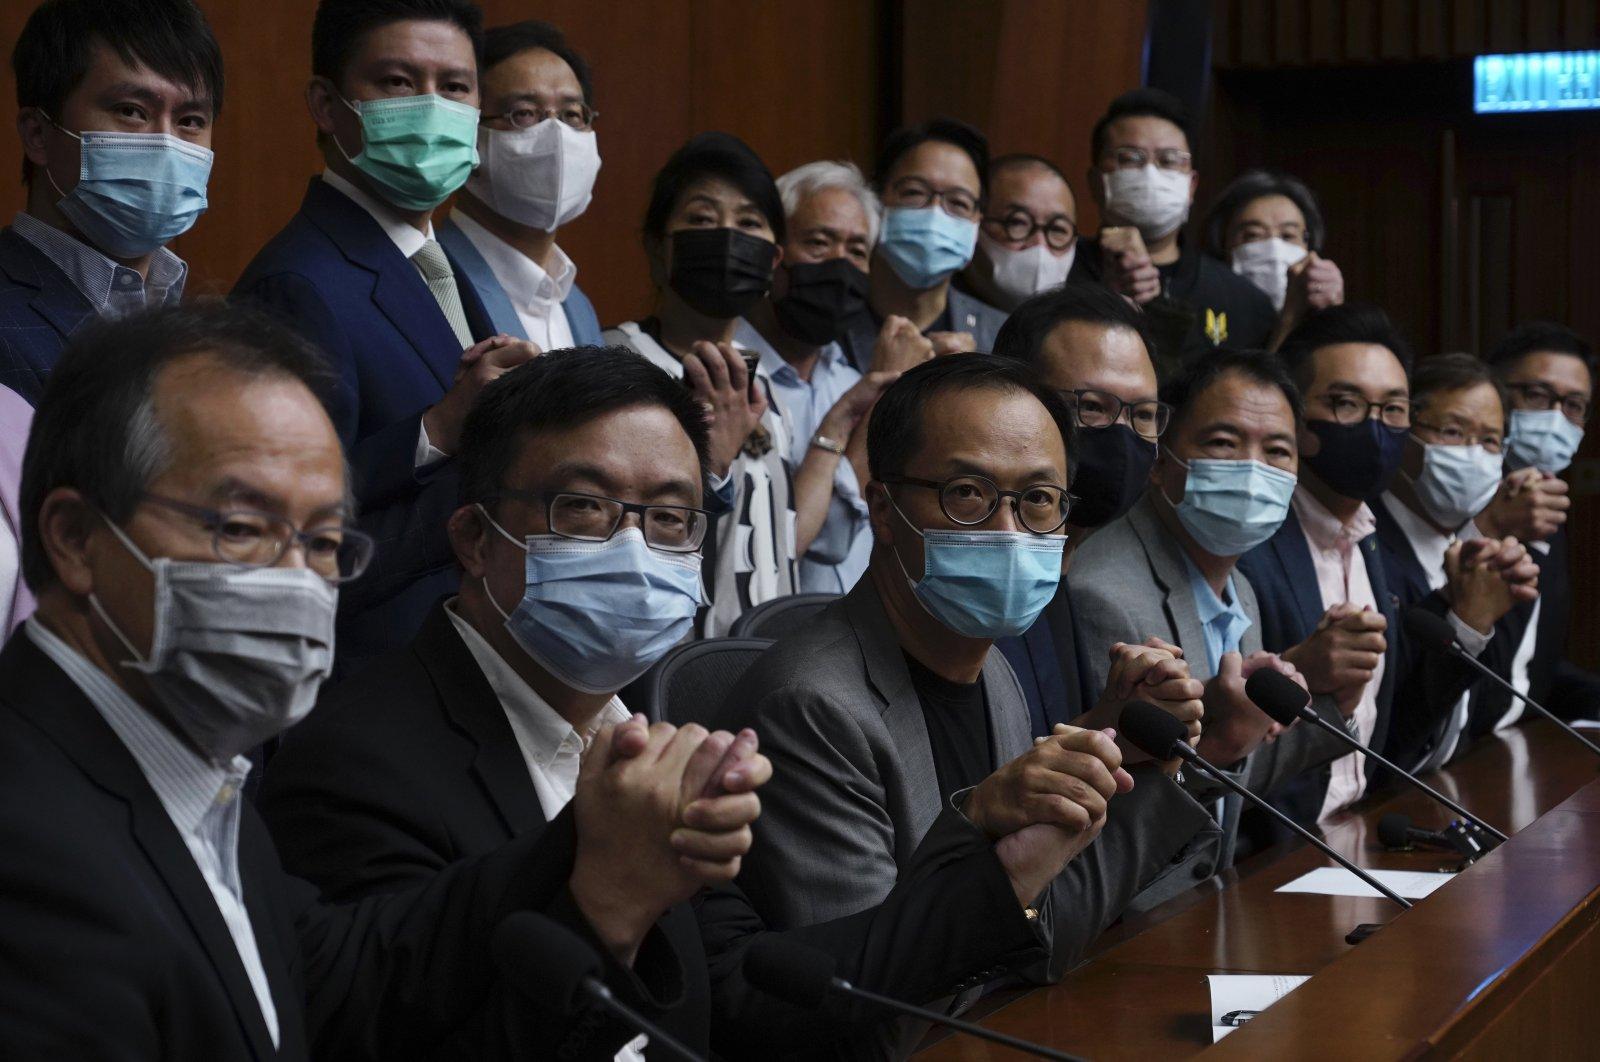 Hong Kong's pro-democracy legislators pose for a picture before a press conference at the Legislative Council in Hong Kong, Nov. 9, 2020. (AP Photo)